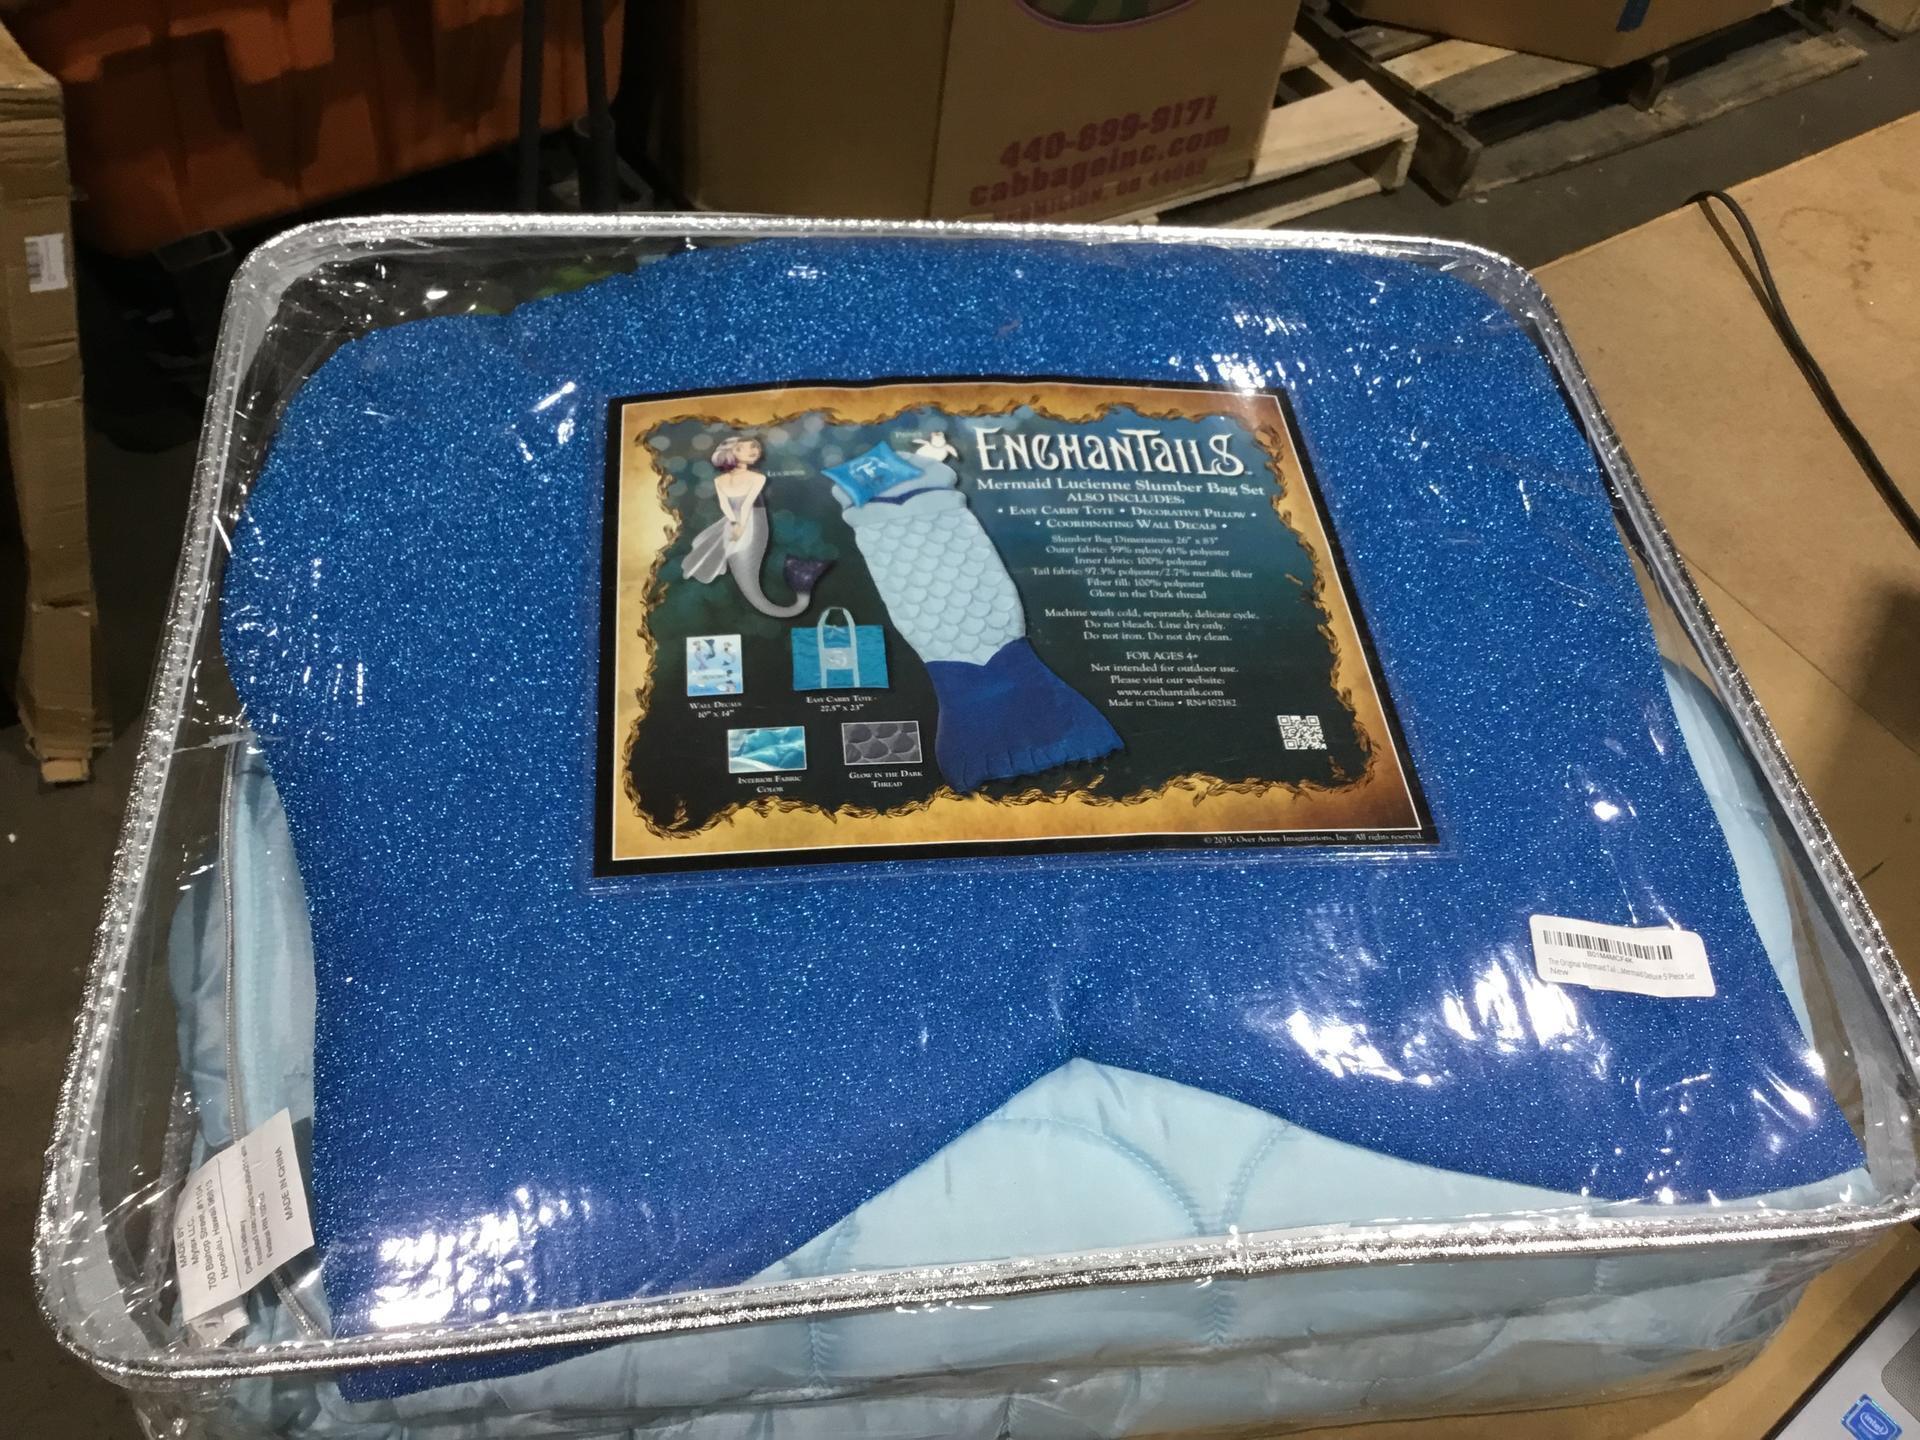 Enchantails - Mermaid Tail Sleeping Bag (Blue) - Includes: Bag, Pillow, Case, & Book